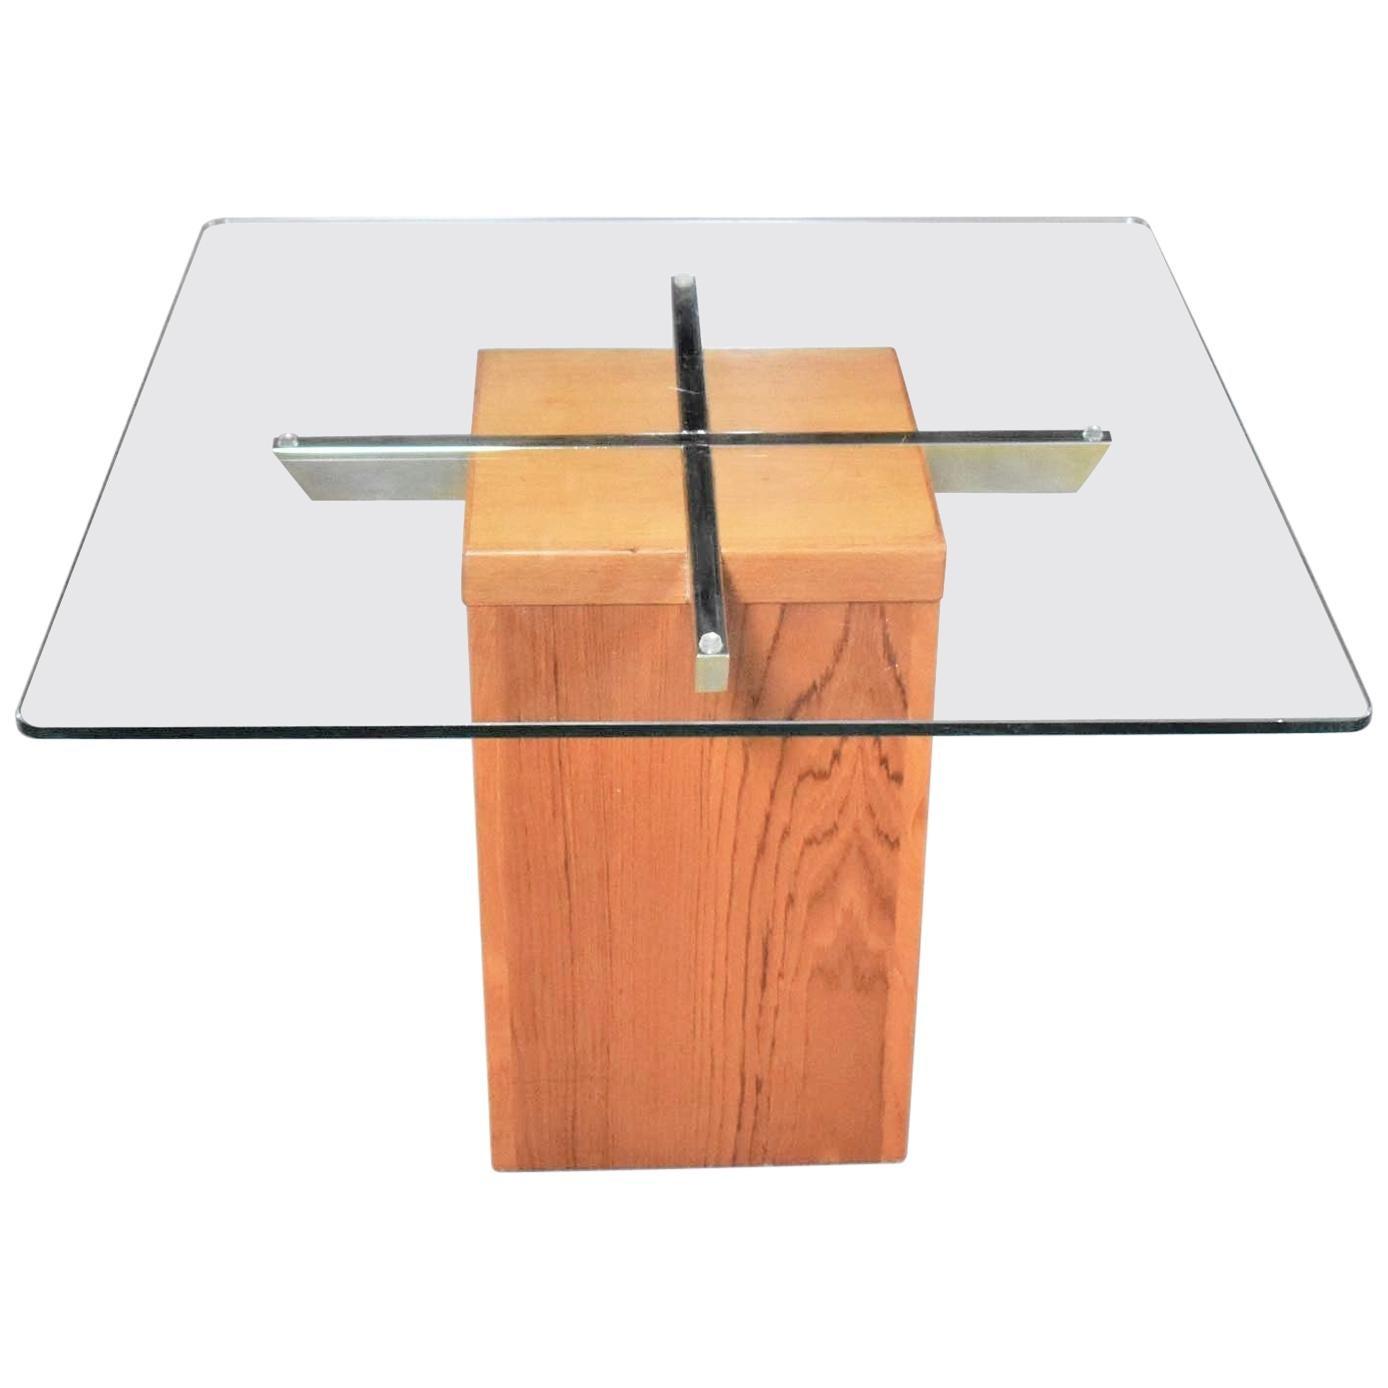 Midcentury Scandinavian Modern Square Teak Chrome and Glass Side Table